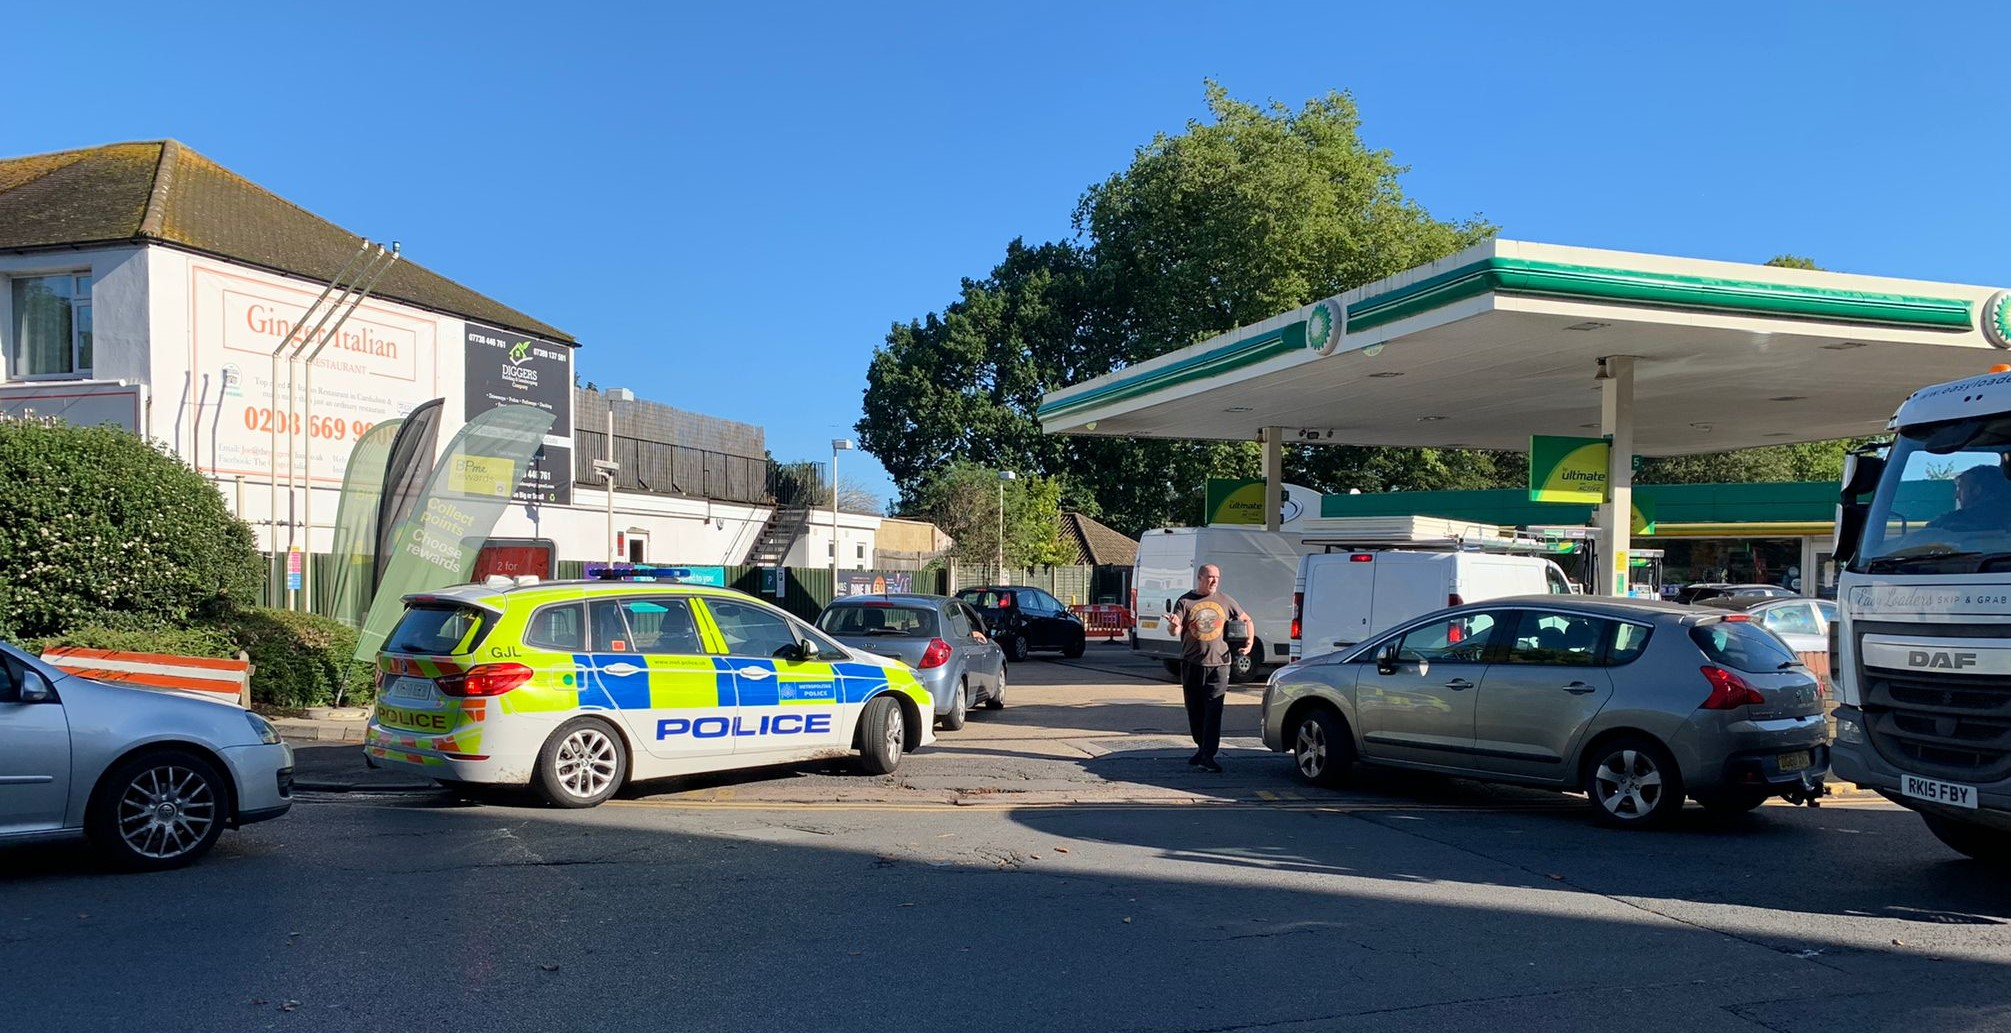 Lib Dem Bobby Dean Slams Government for Fuel Crisis